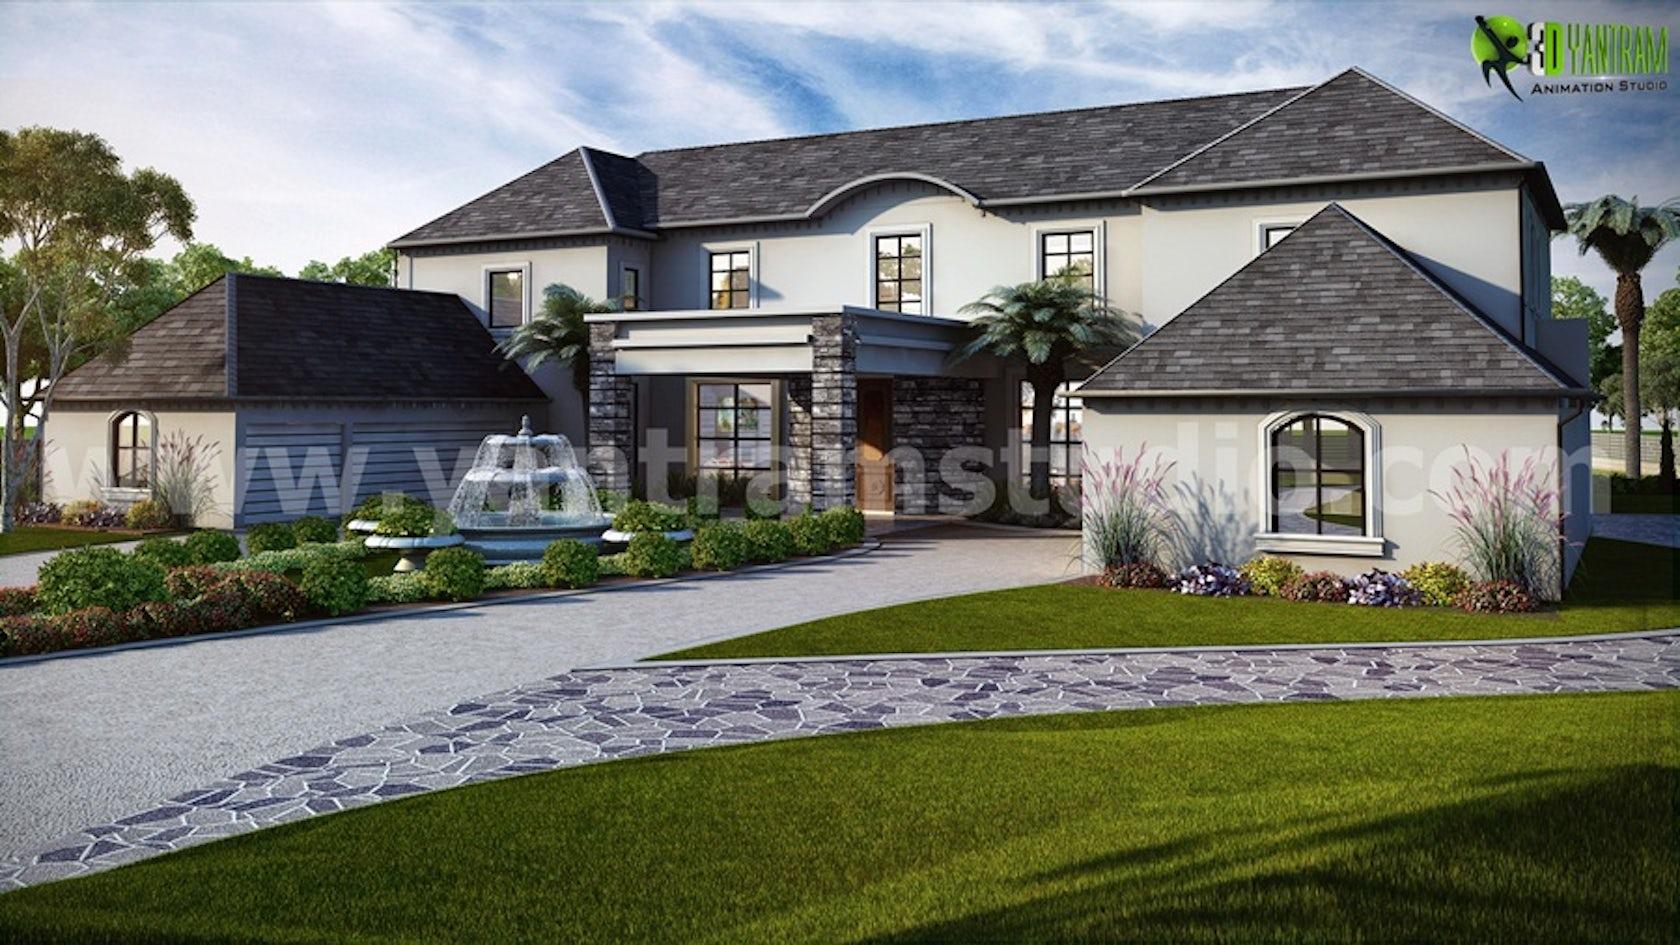 Classic exterior residential house design architizer for Exterior classic design